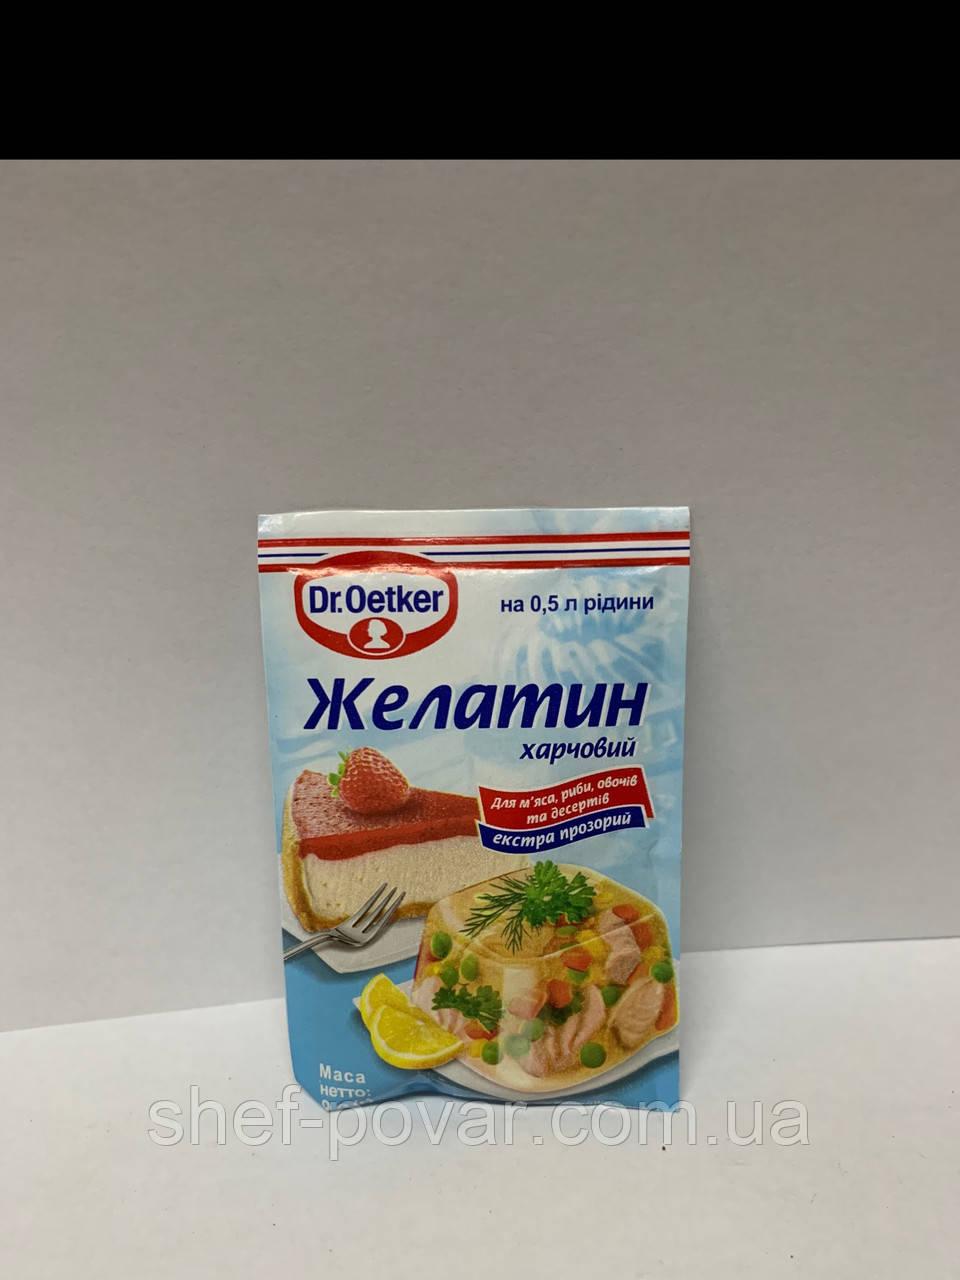 "Желатин пищевой 9 гр. ТМ ""Dr. Oetker """